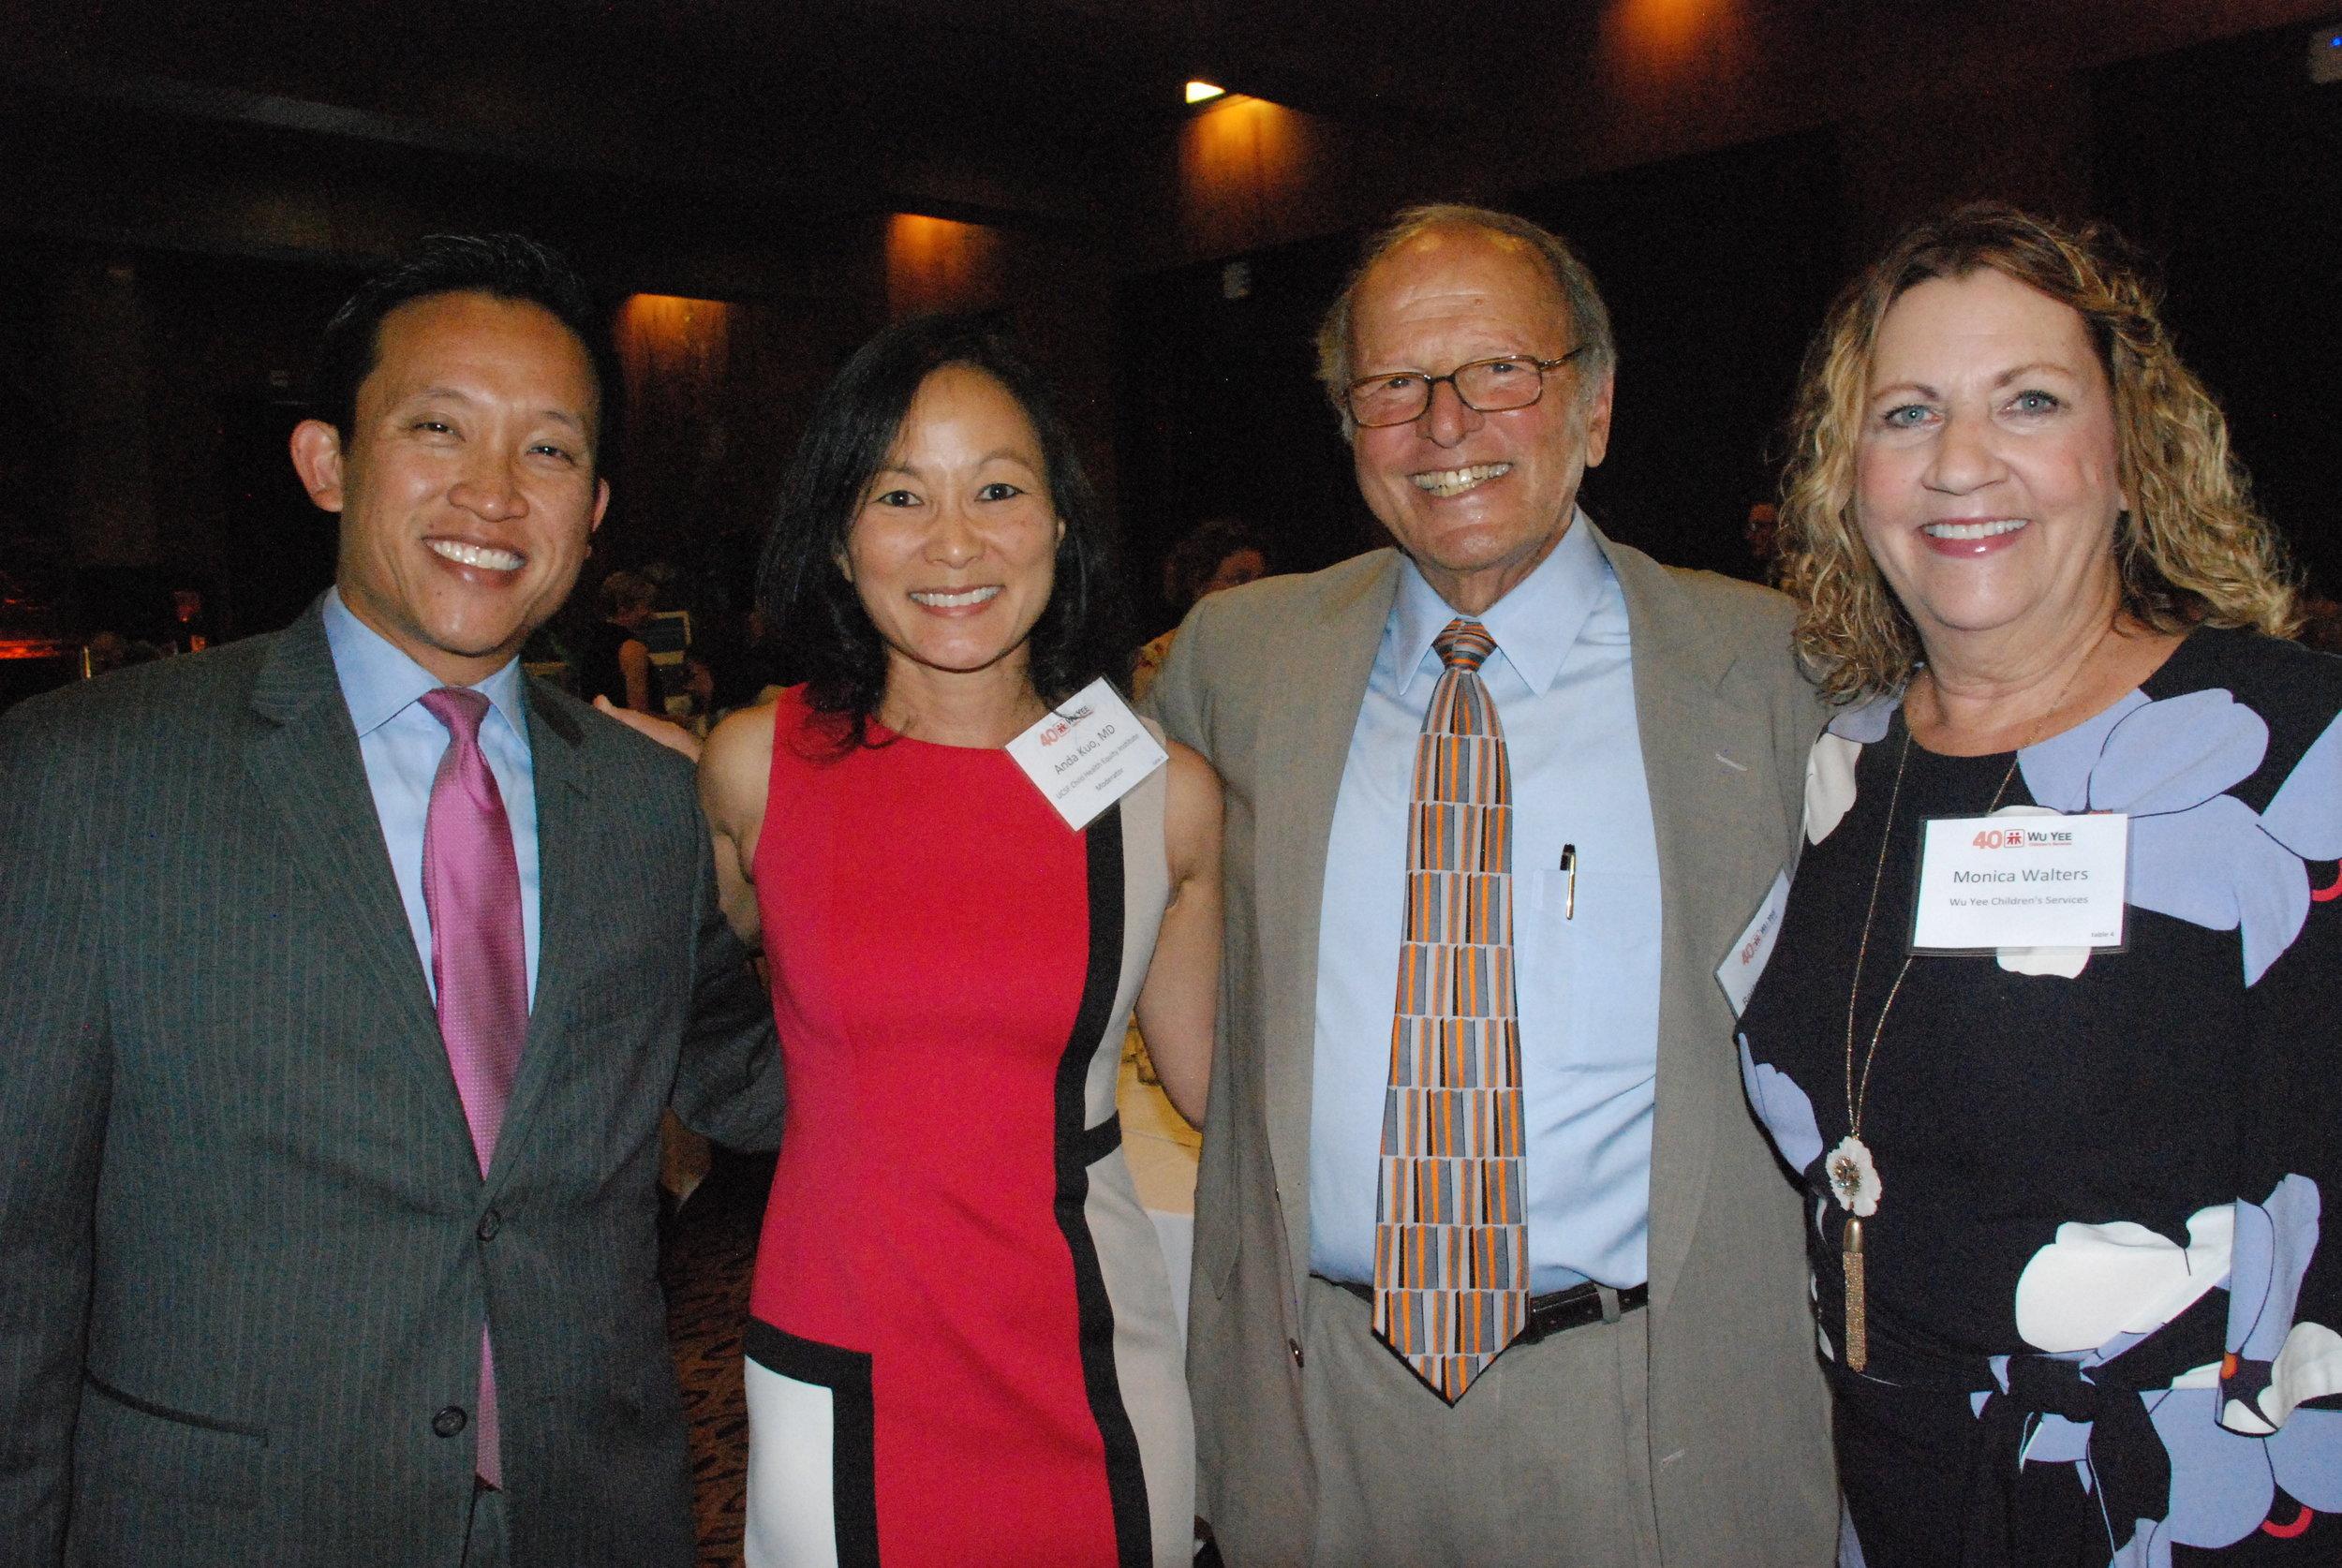 California State Assemblymember David Chiu, Anda Kuo, MD, Bertam Lubin, MD, and Wu Yee's CEO, Monica Walters